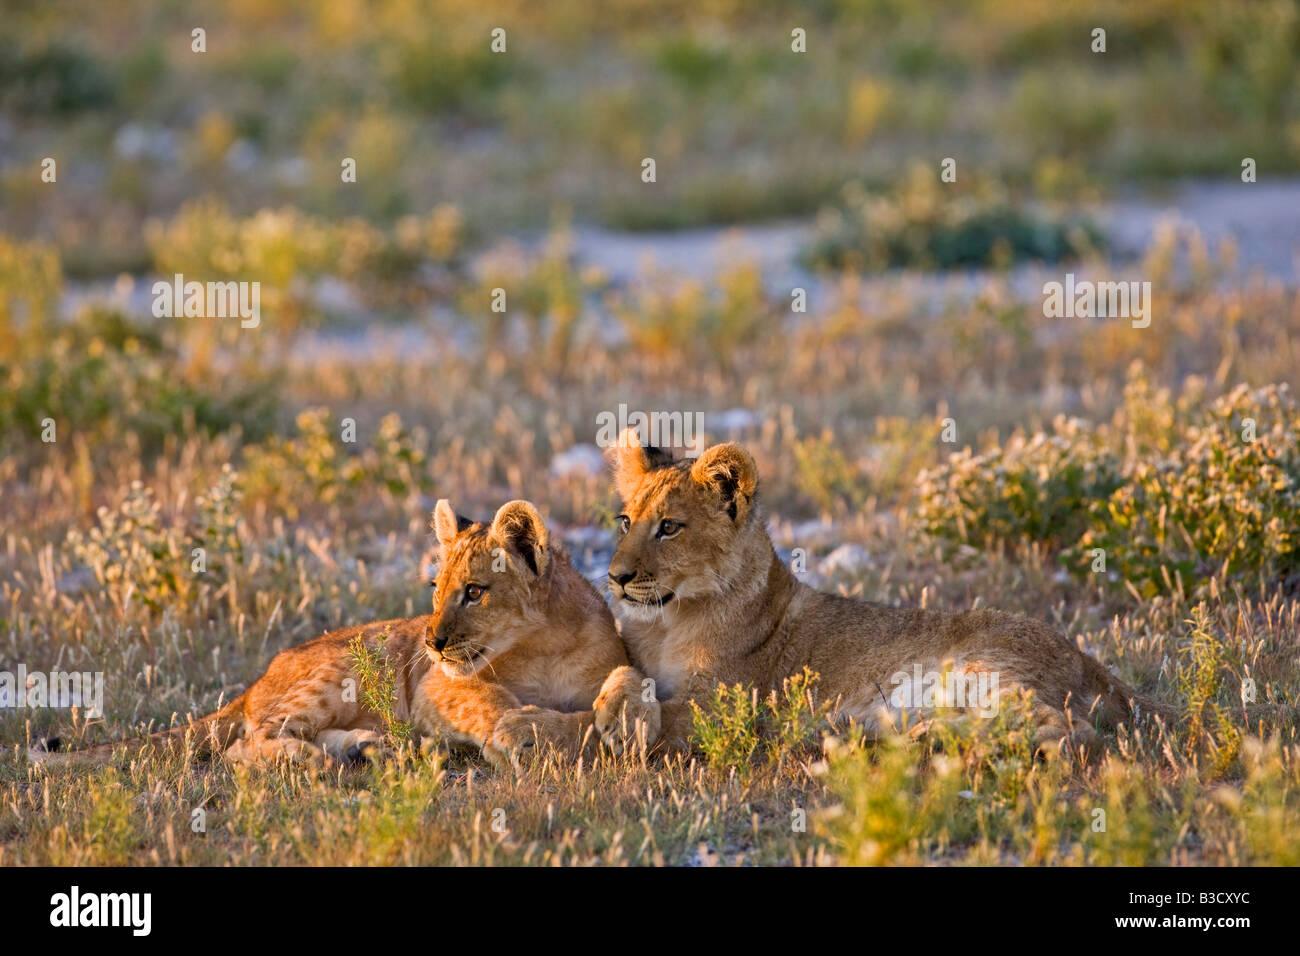 África, Botswana, cachorros de león (Panthera leo) Foto de stock